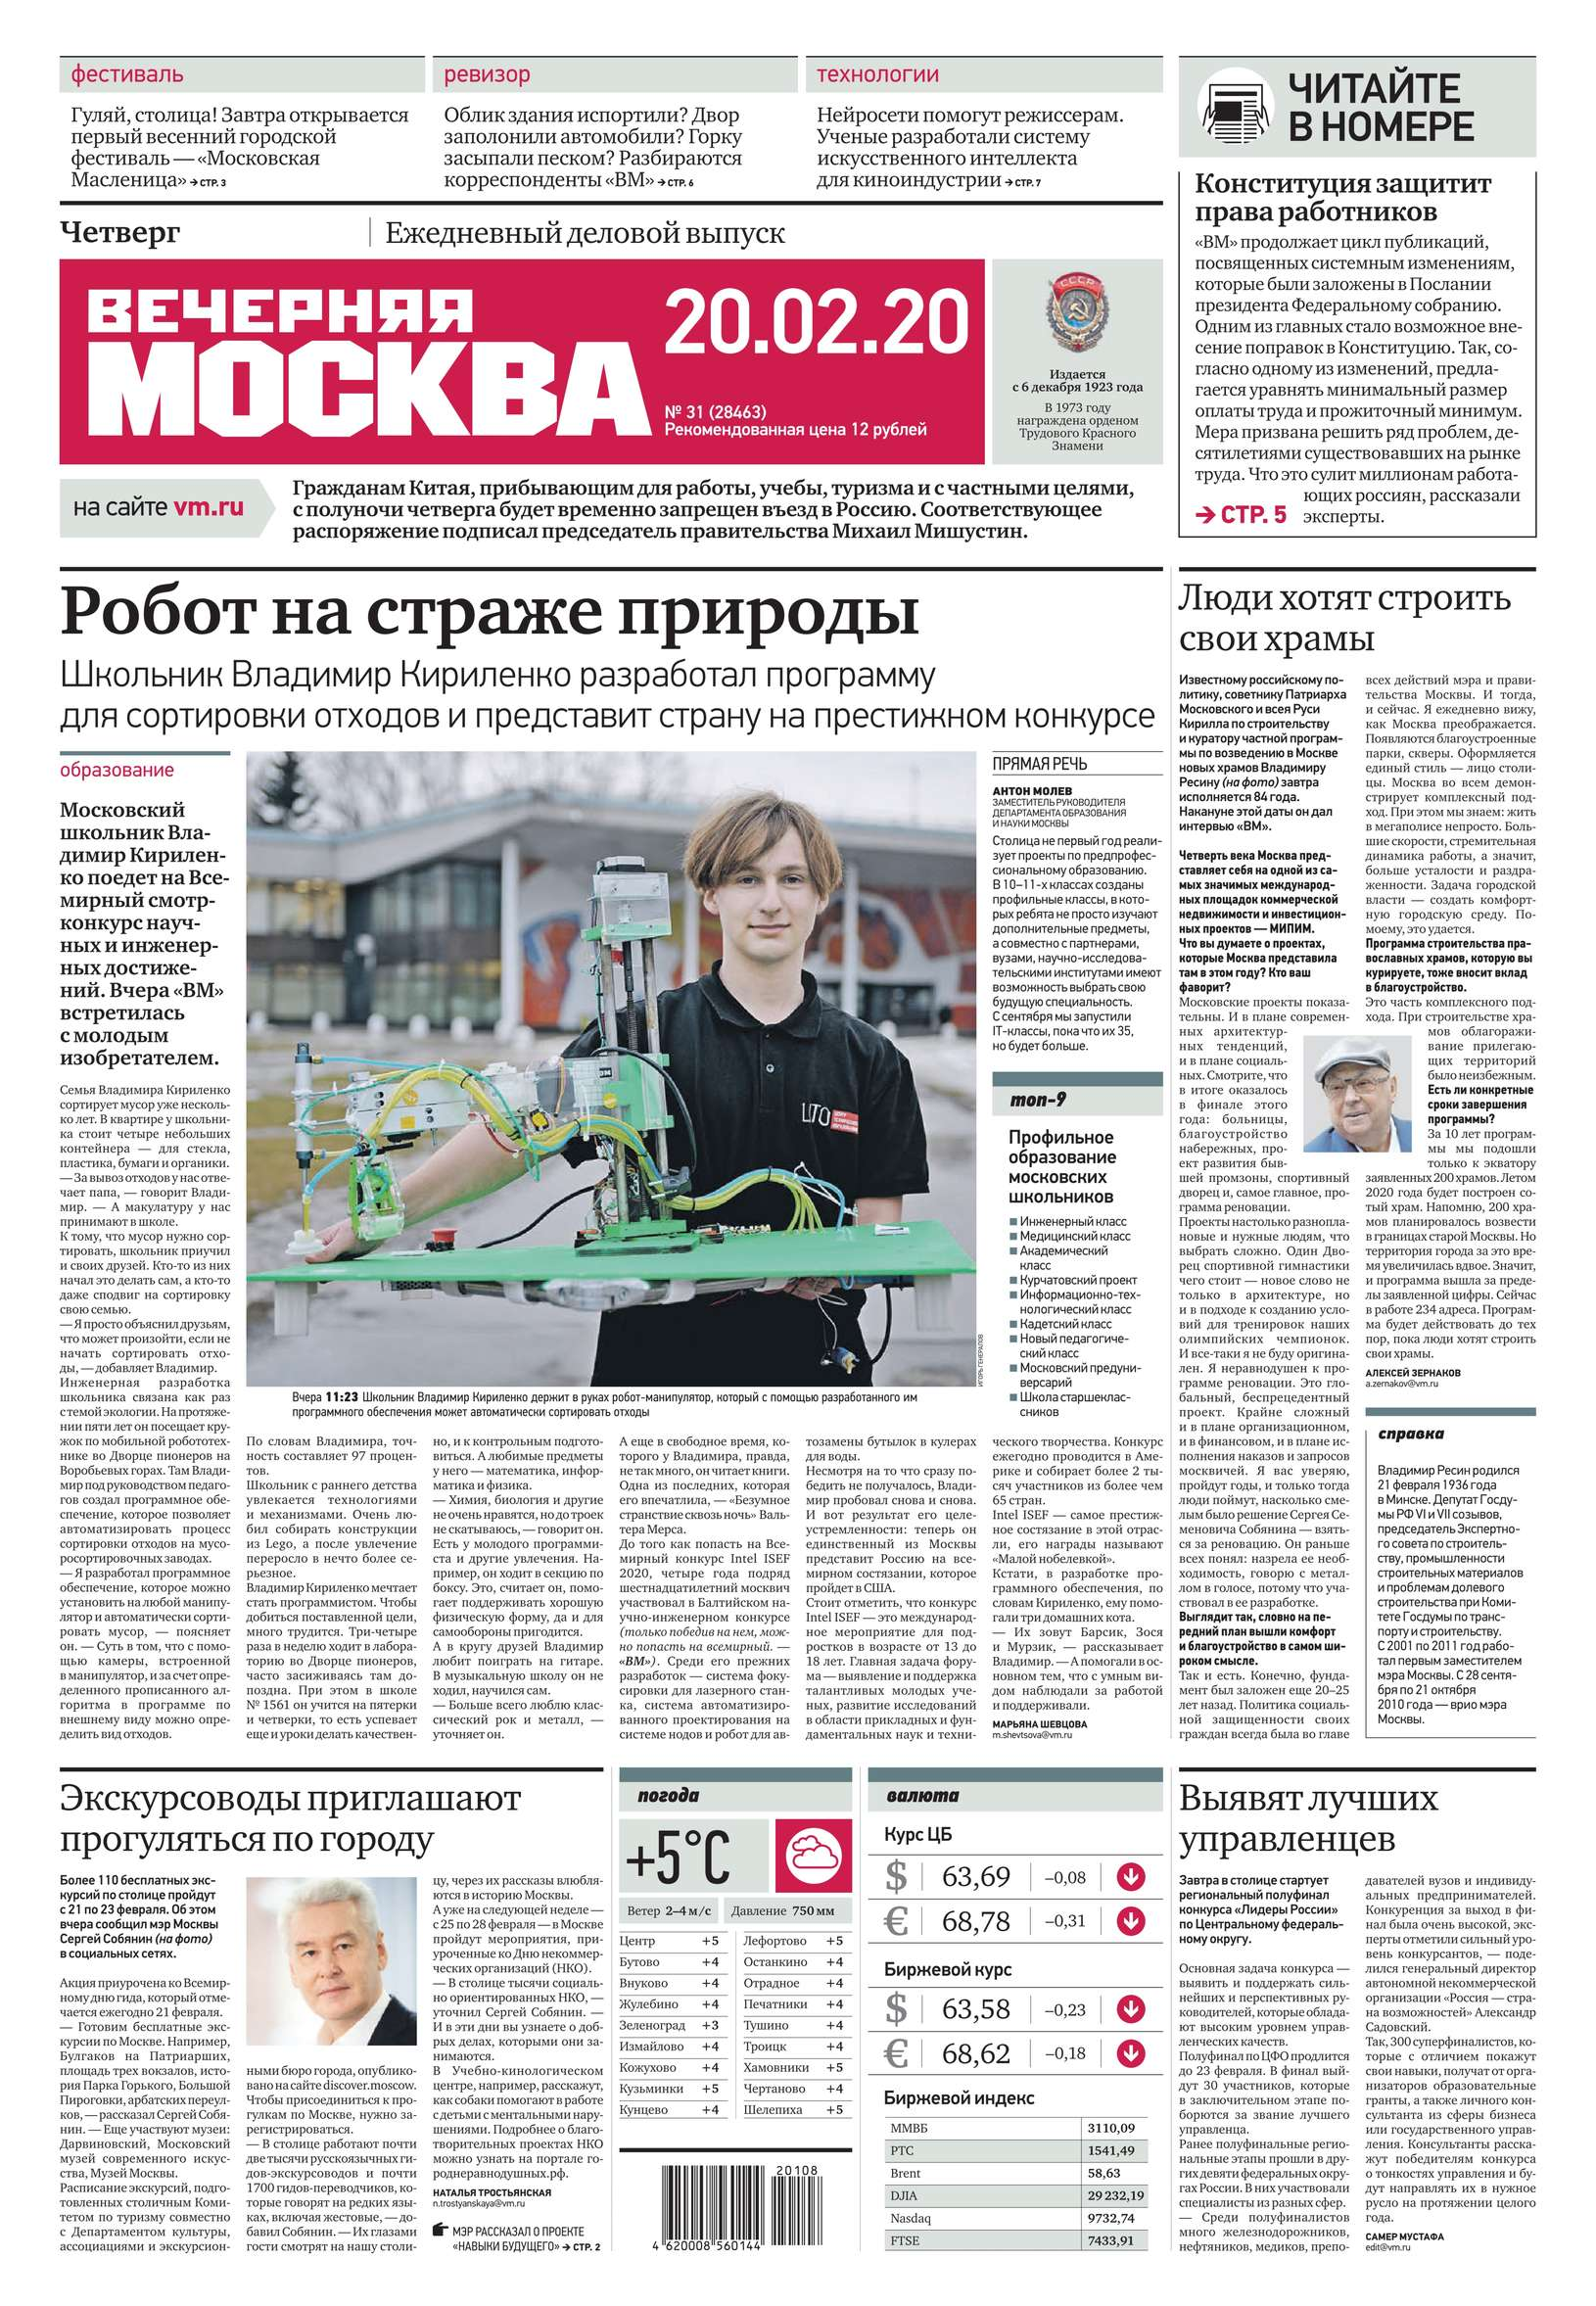 Редакция газеты Вечерняя Москва Вечерняя Москва 31-2020